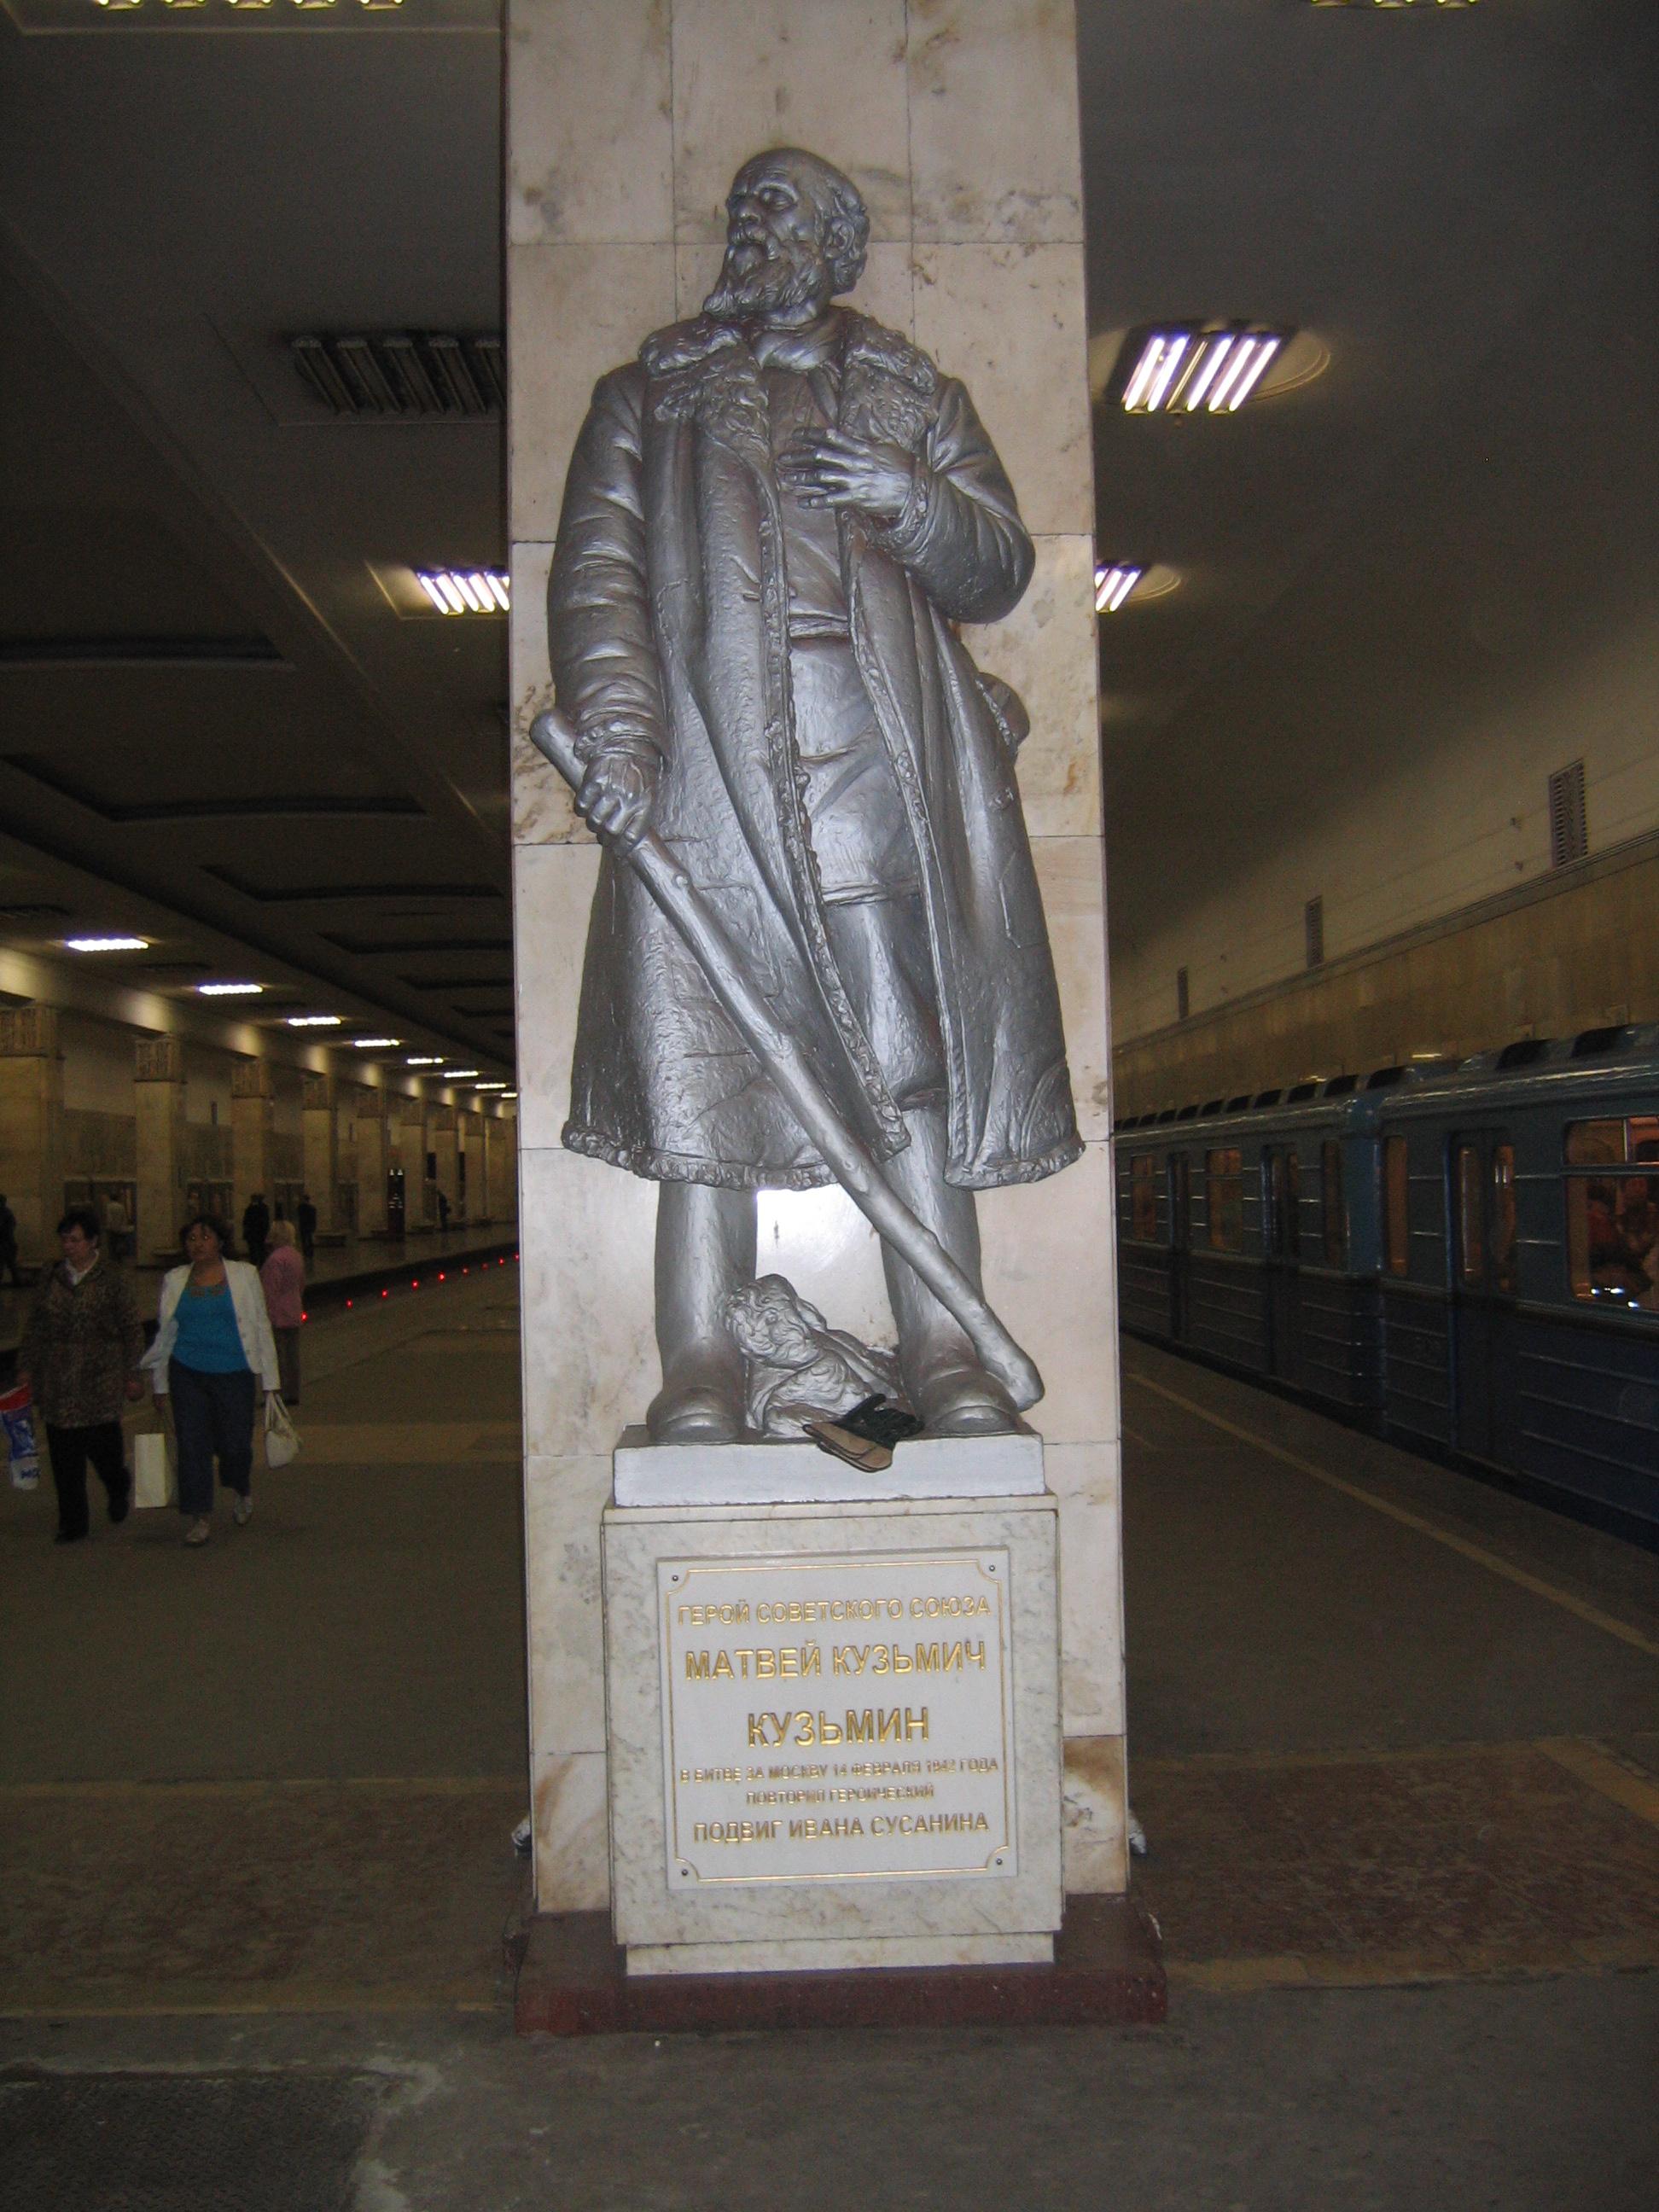 Matvey_Kuzmin_monument_(Partizanskaya_station,_Moscow)